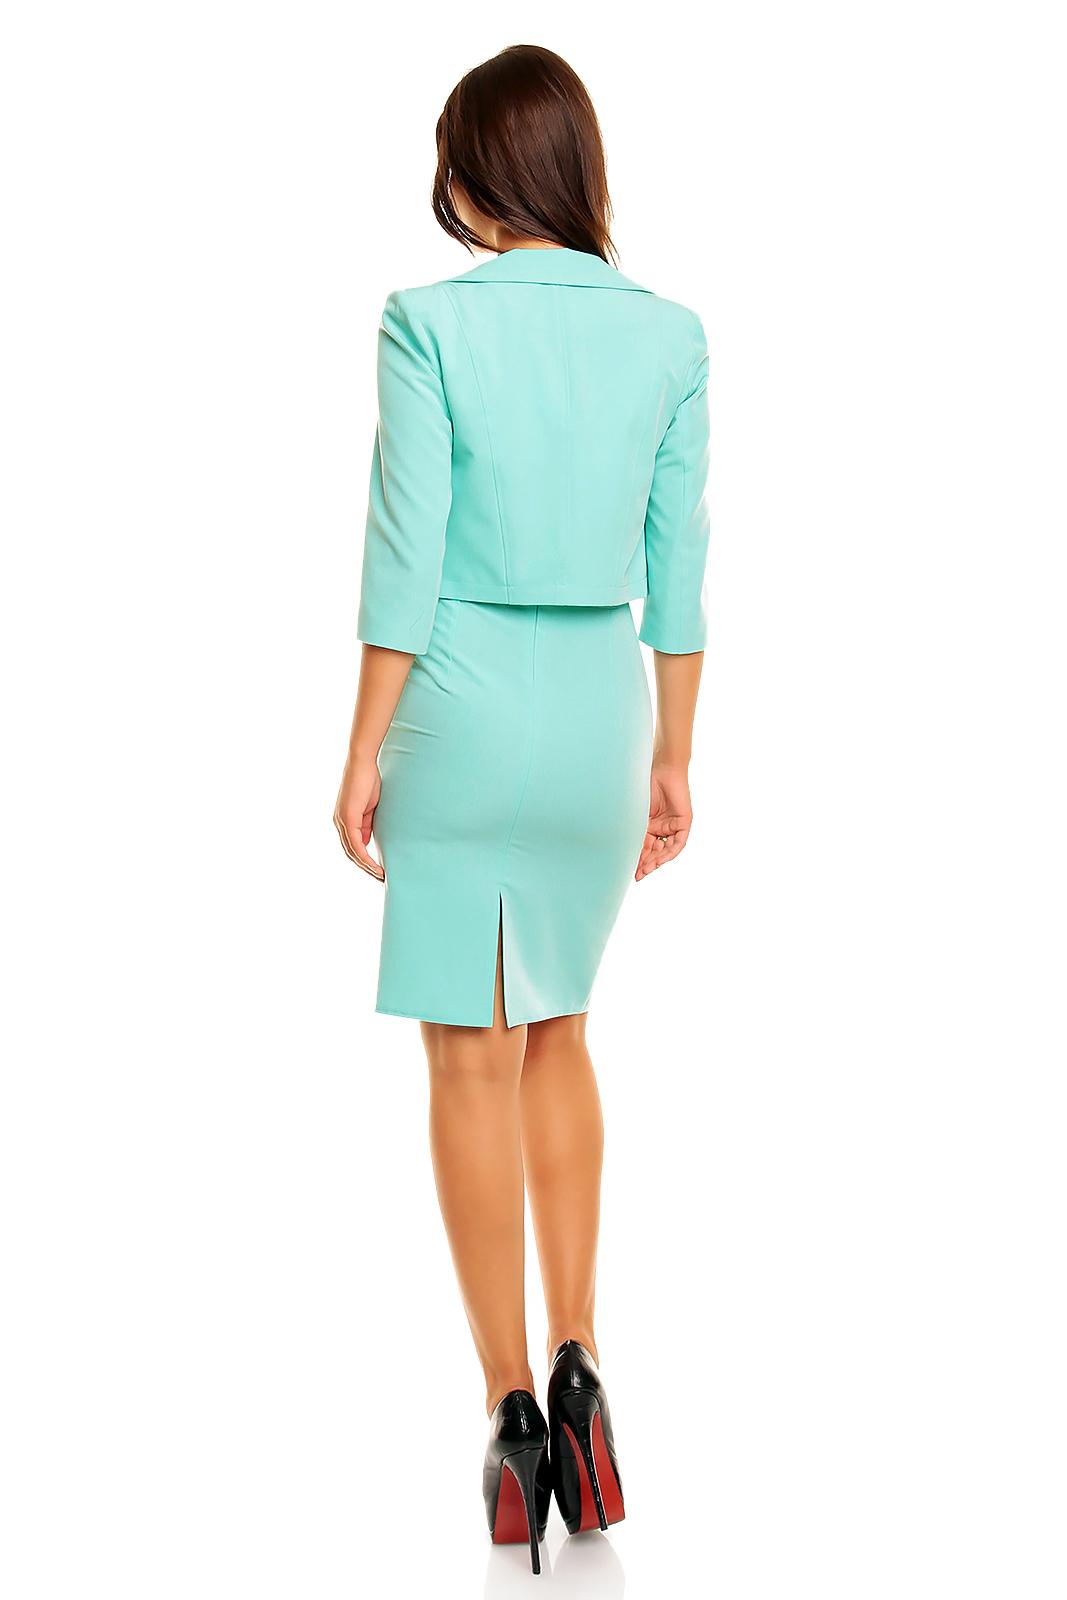 ea60a8253d Seksowny i elegancki komplet żakiet z sukienką KM162-4 mięta - ❤  Kartes-Moda ❤